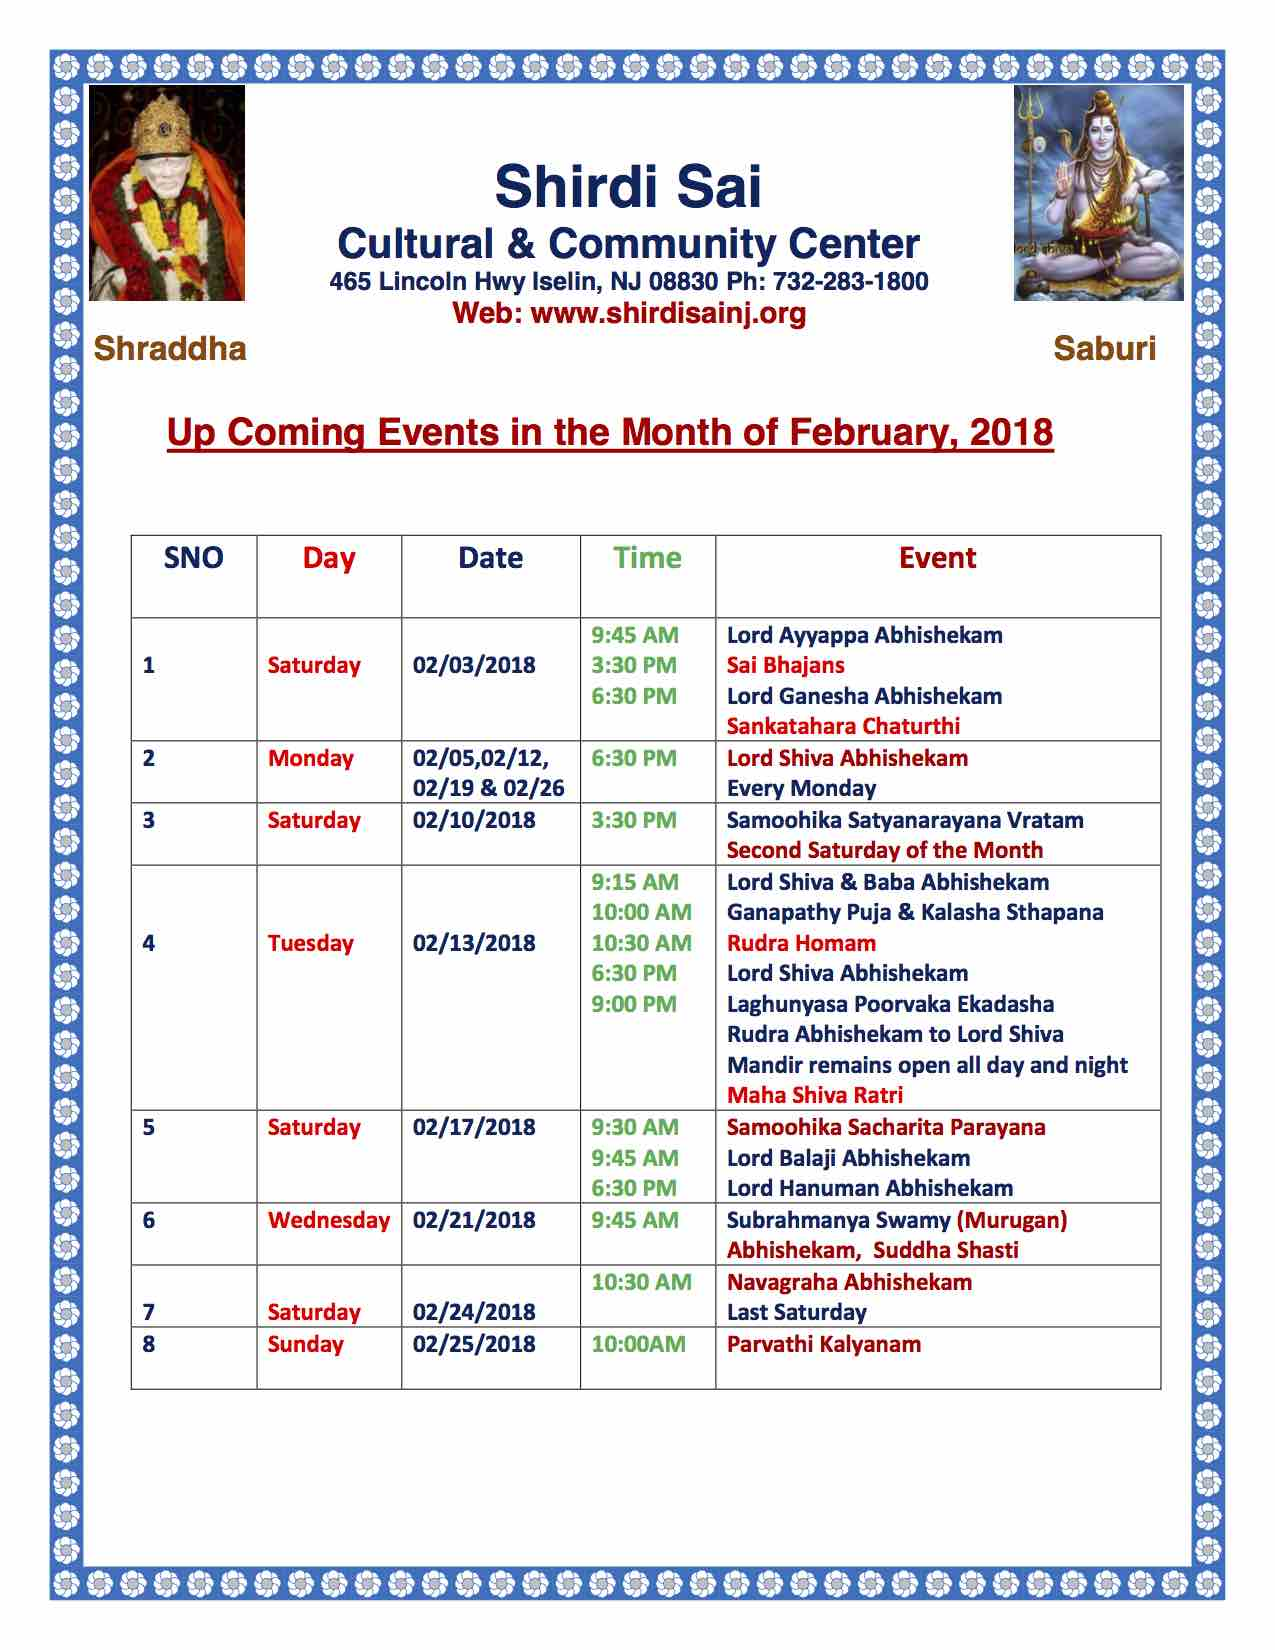 Feb 2018 Programs